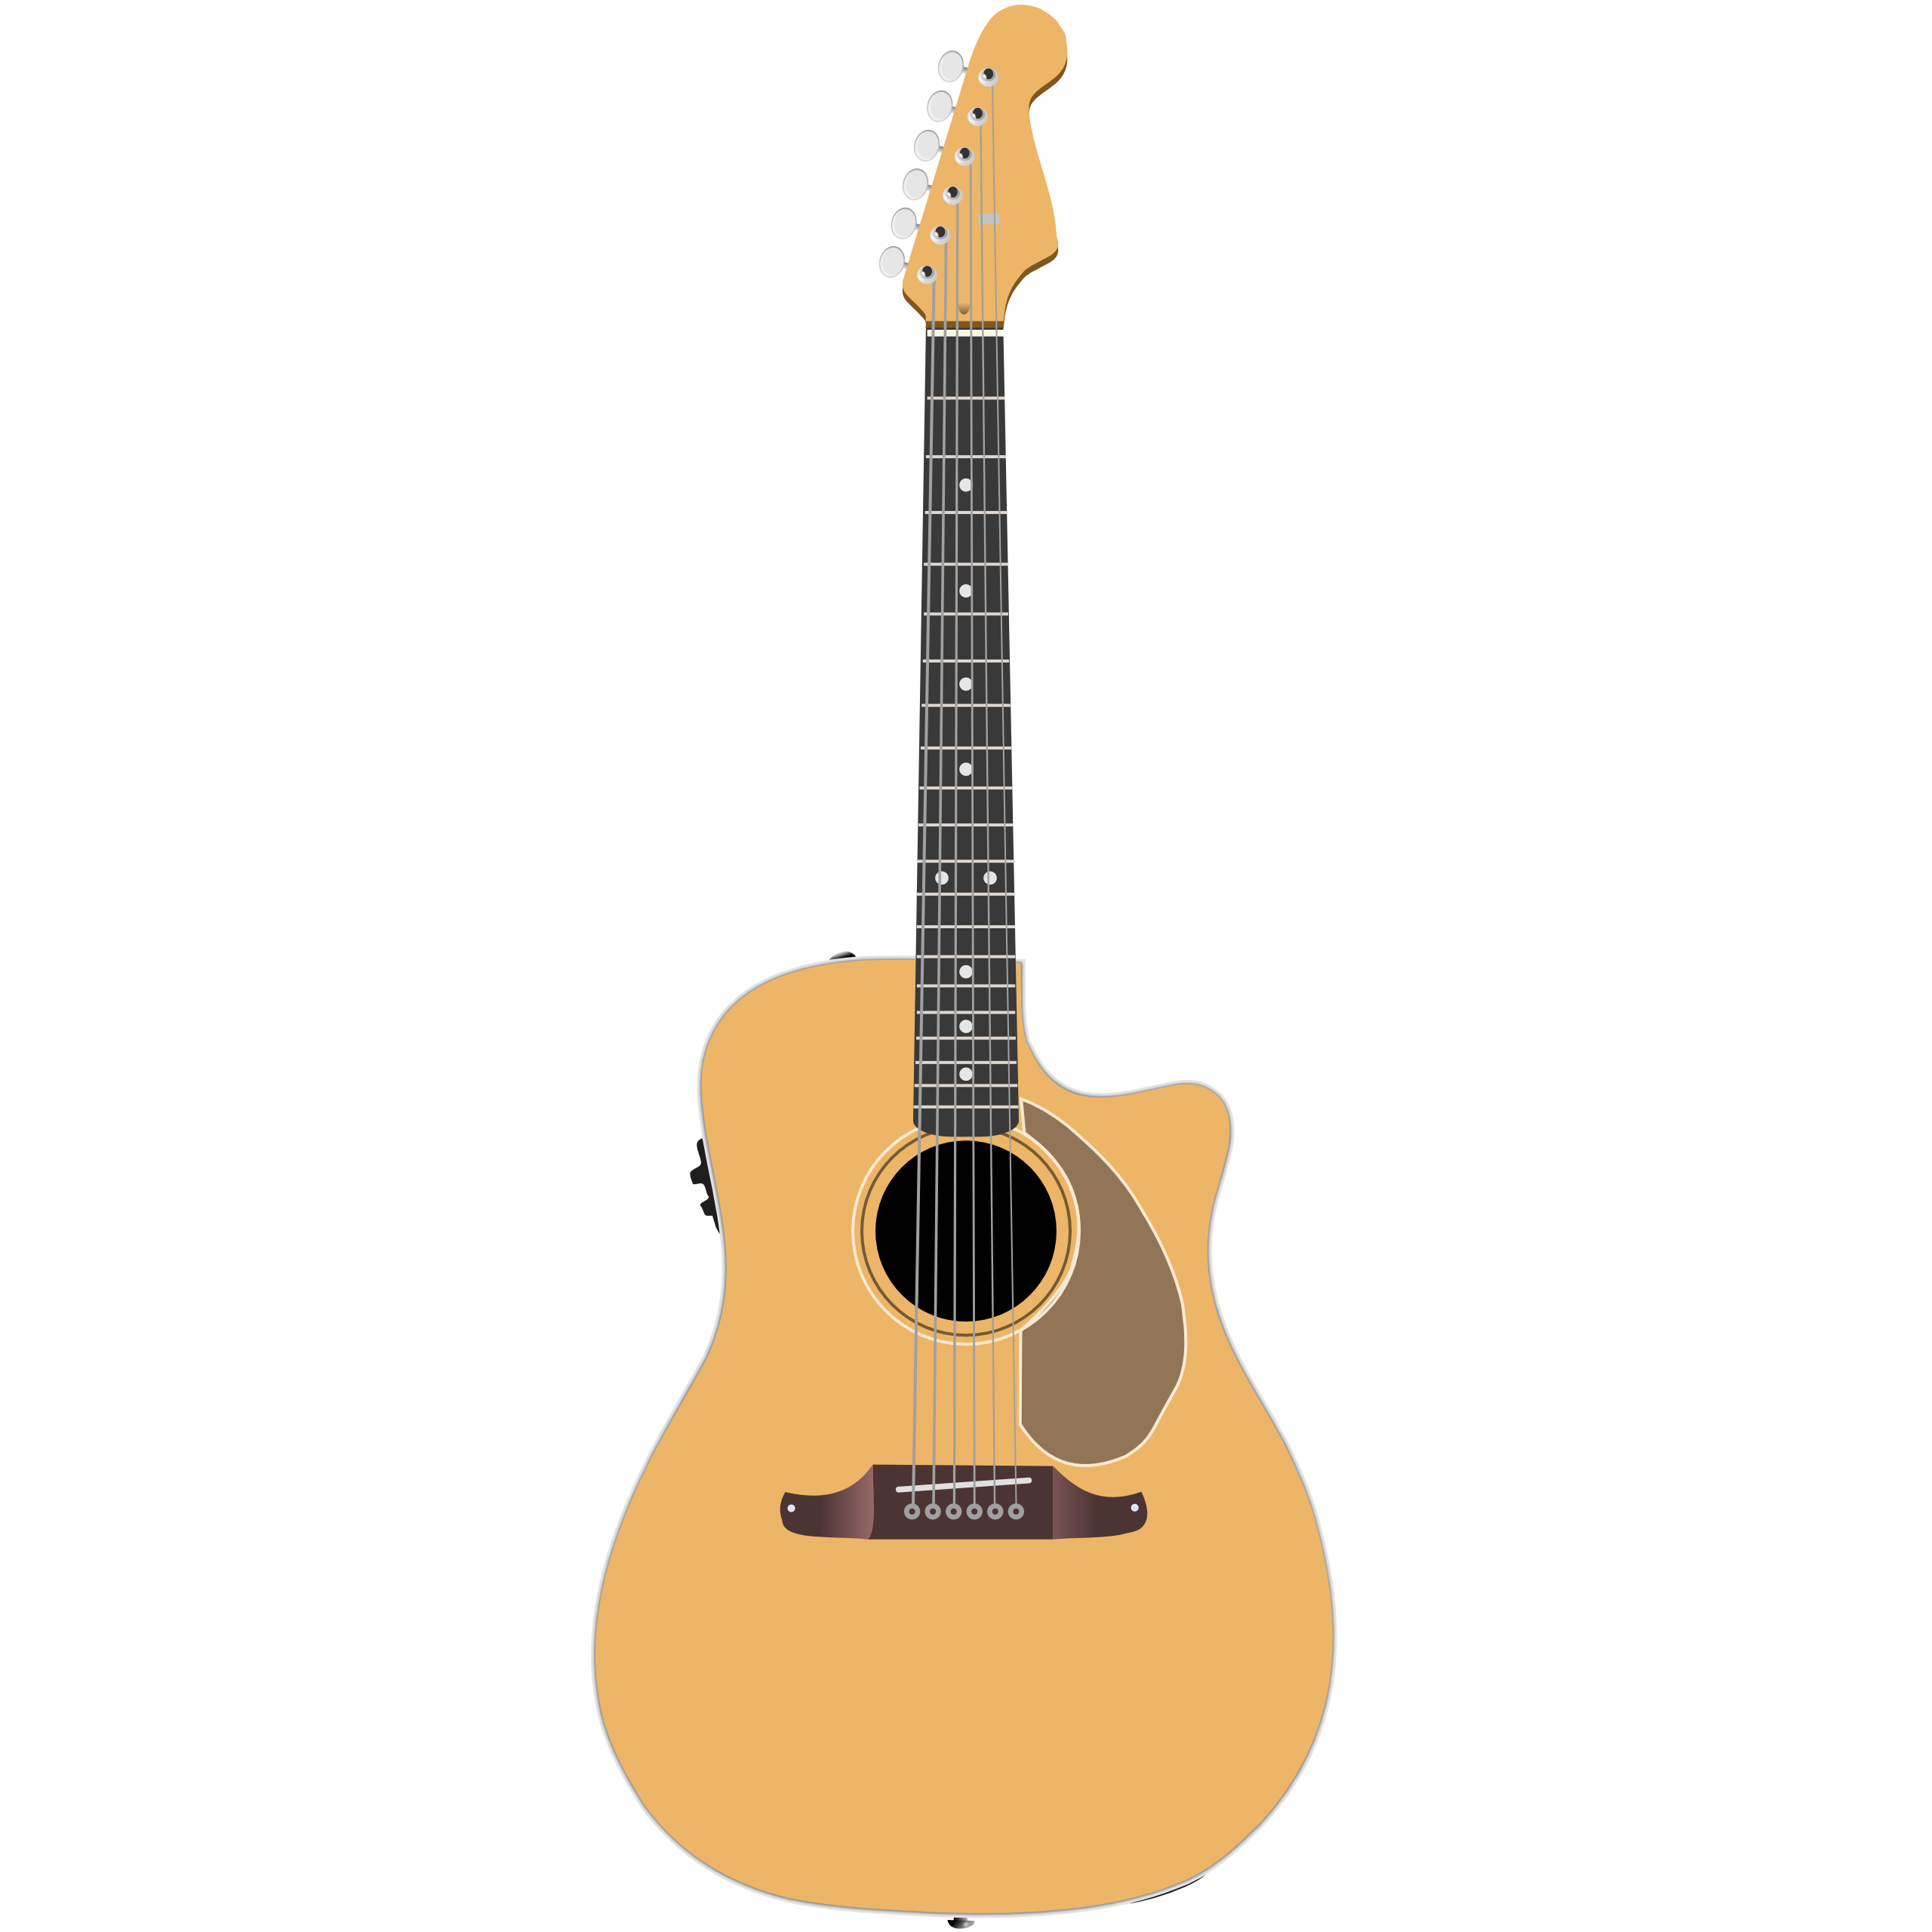 image royalty free Free Vector Guitar